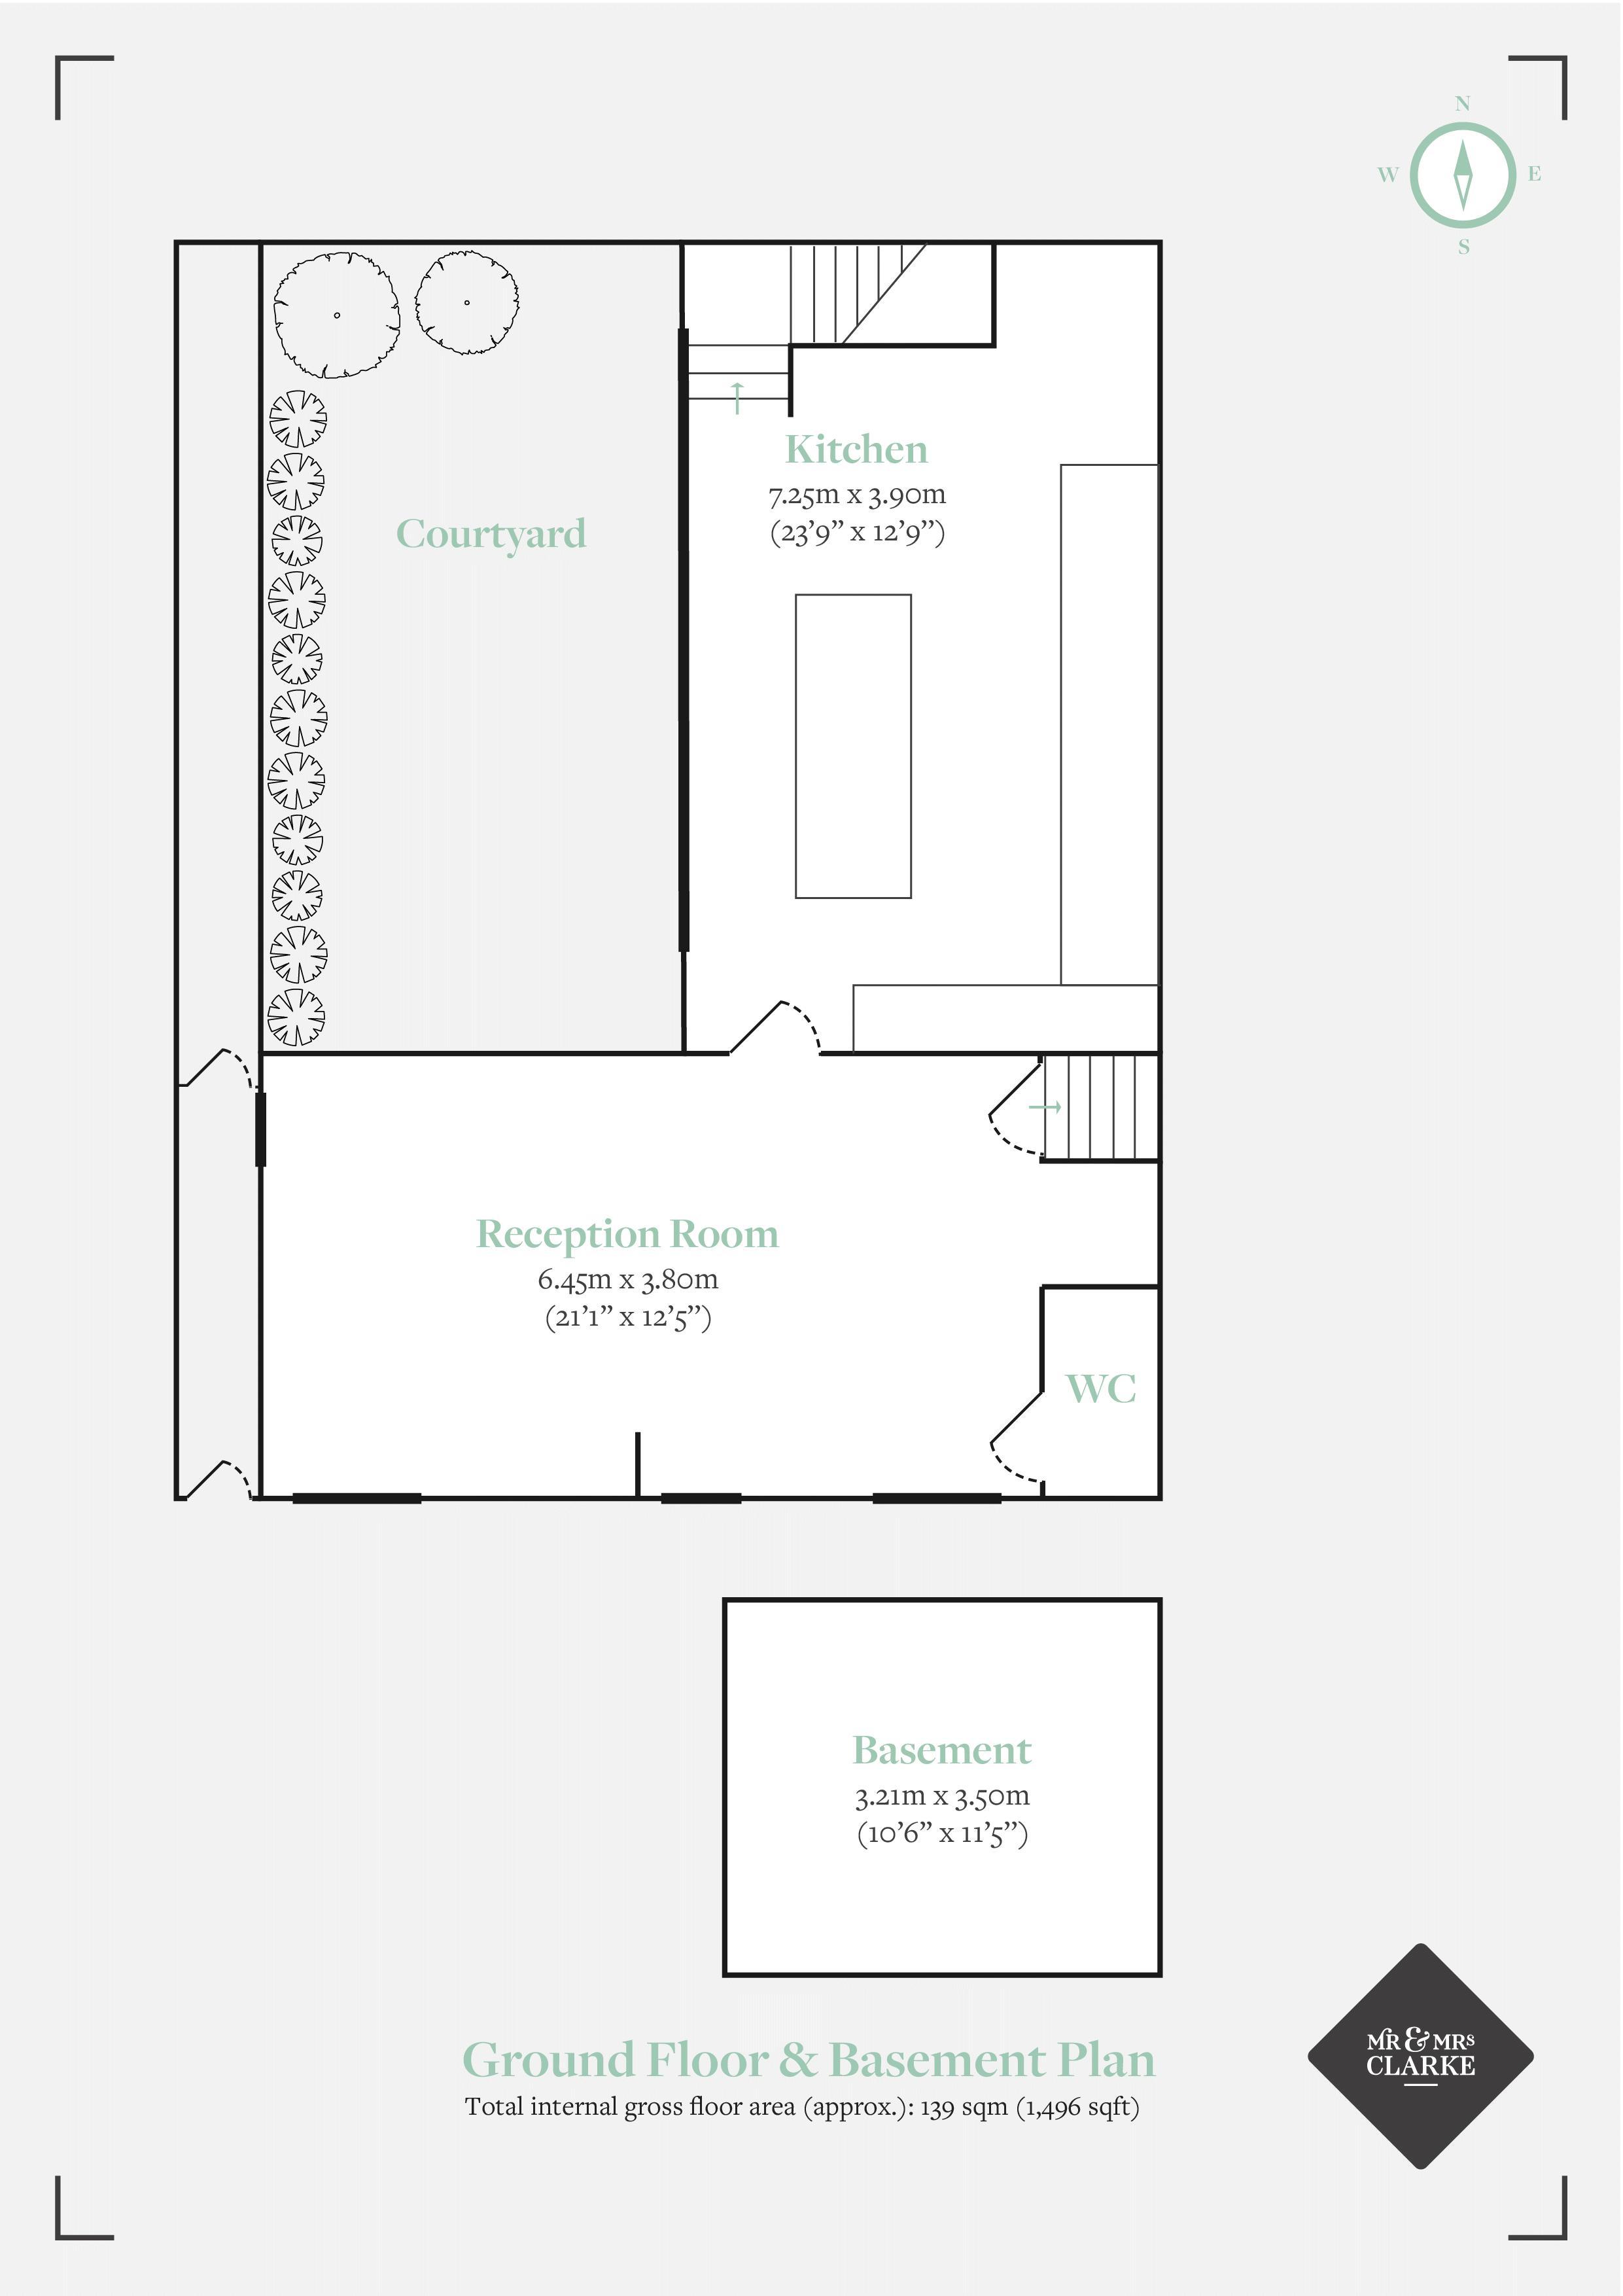 Mary Street, Birmingham Jewellery Quarter. Floorplan. Ground & Basement Plan.